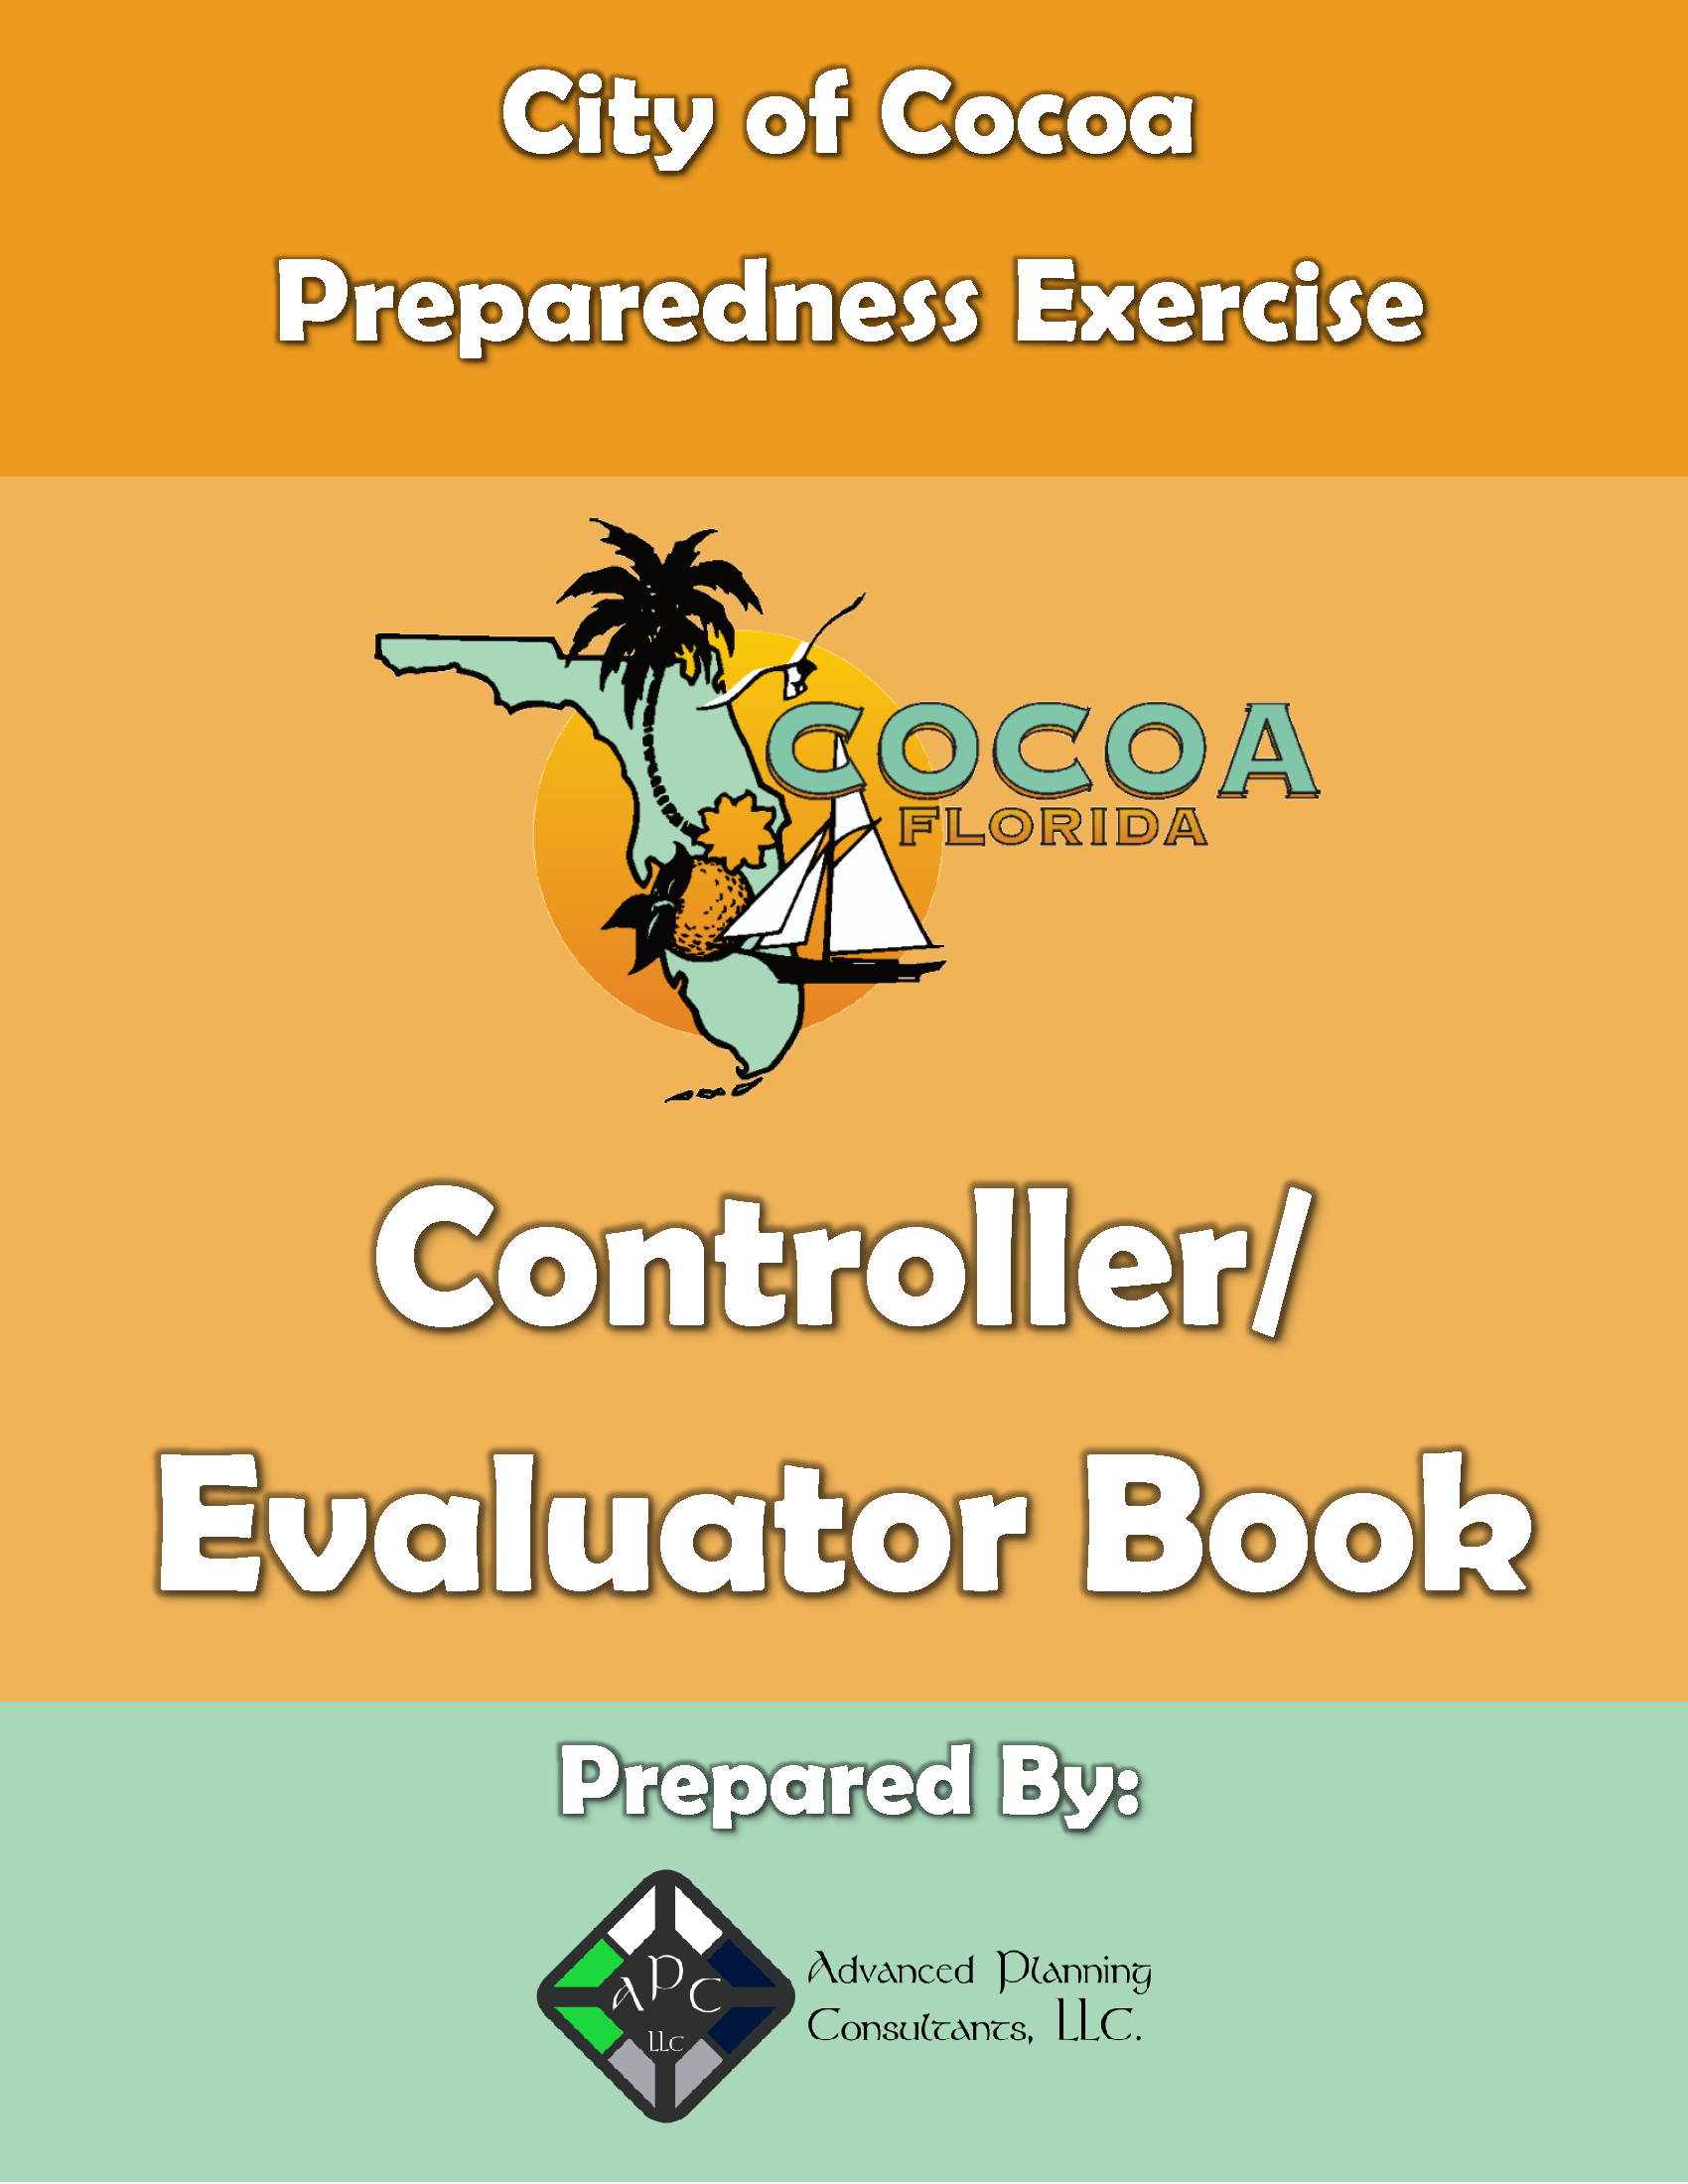 Controller/Evaluator Book